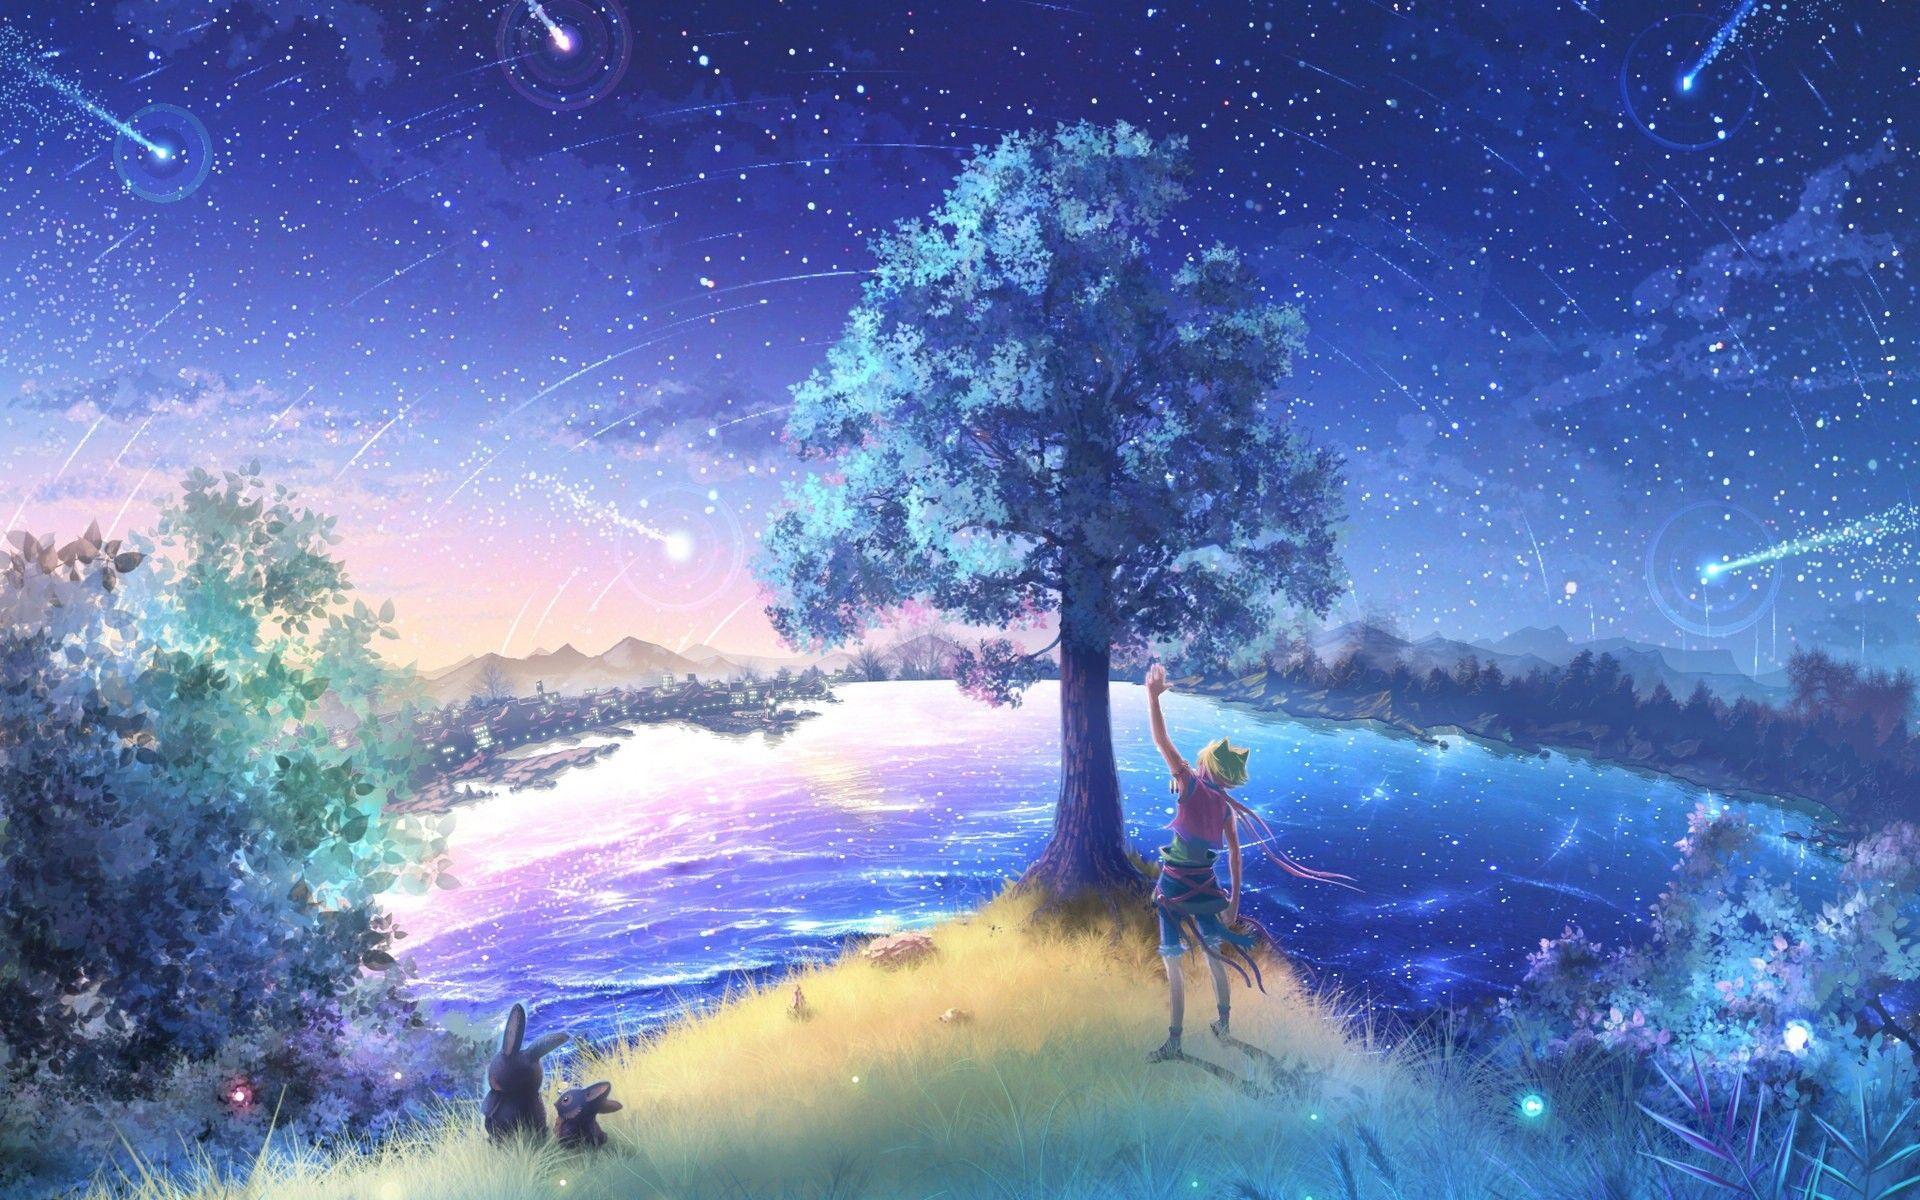 1920x1200 Firefly Summer Beautiful Anime Wallpaper 14 1920x1200